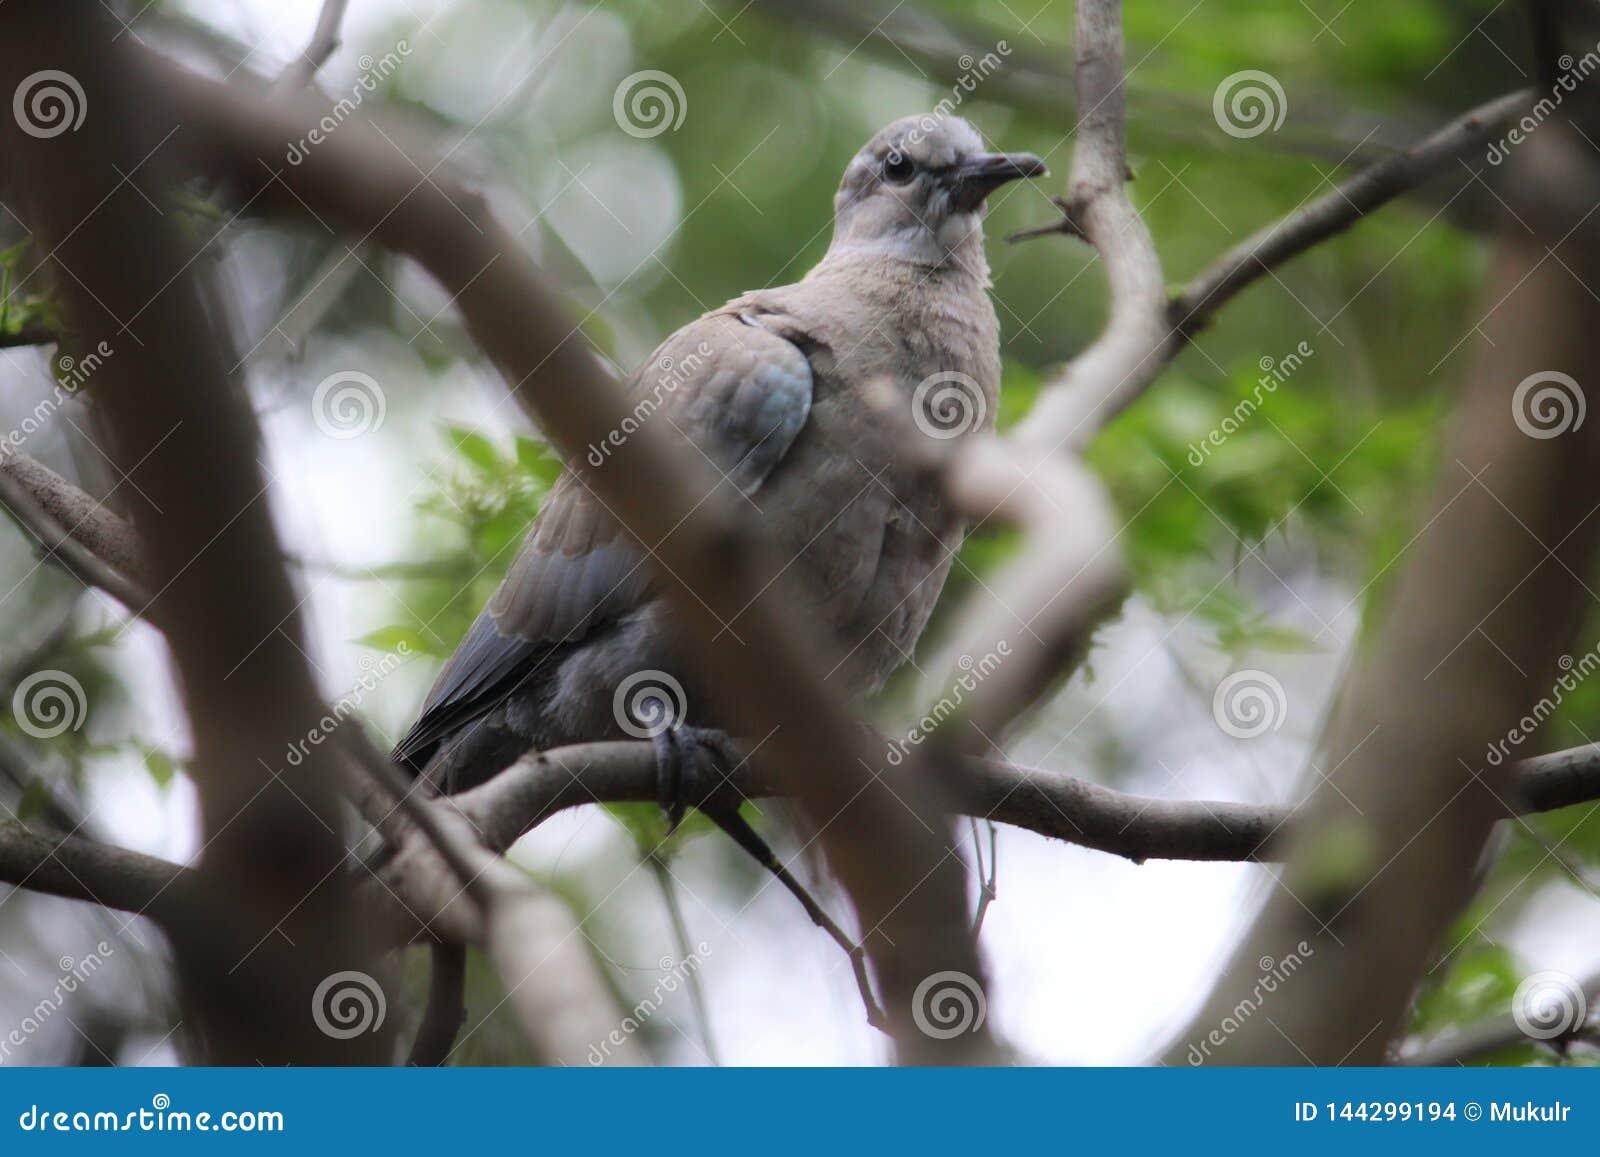 Dove & x28;Eurasian collared dove& x29;